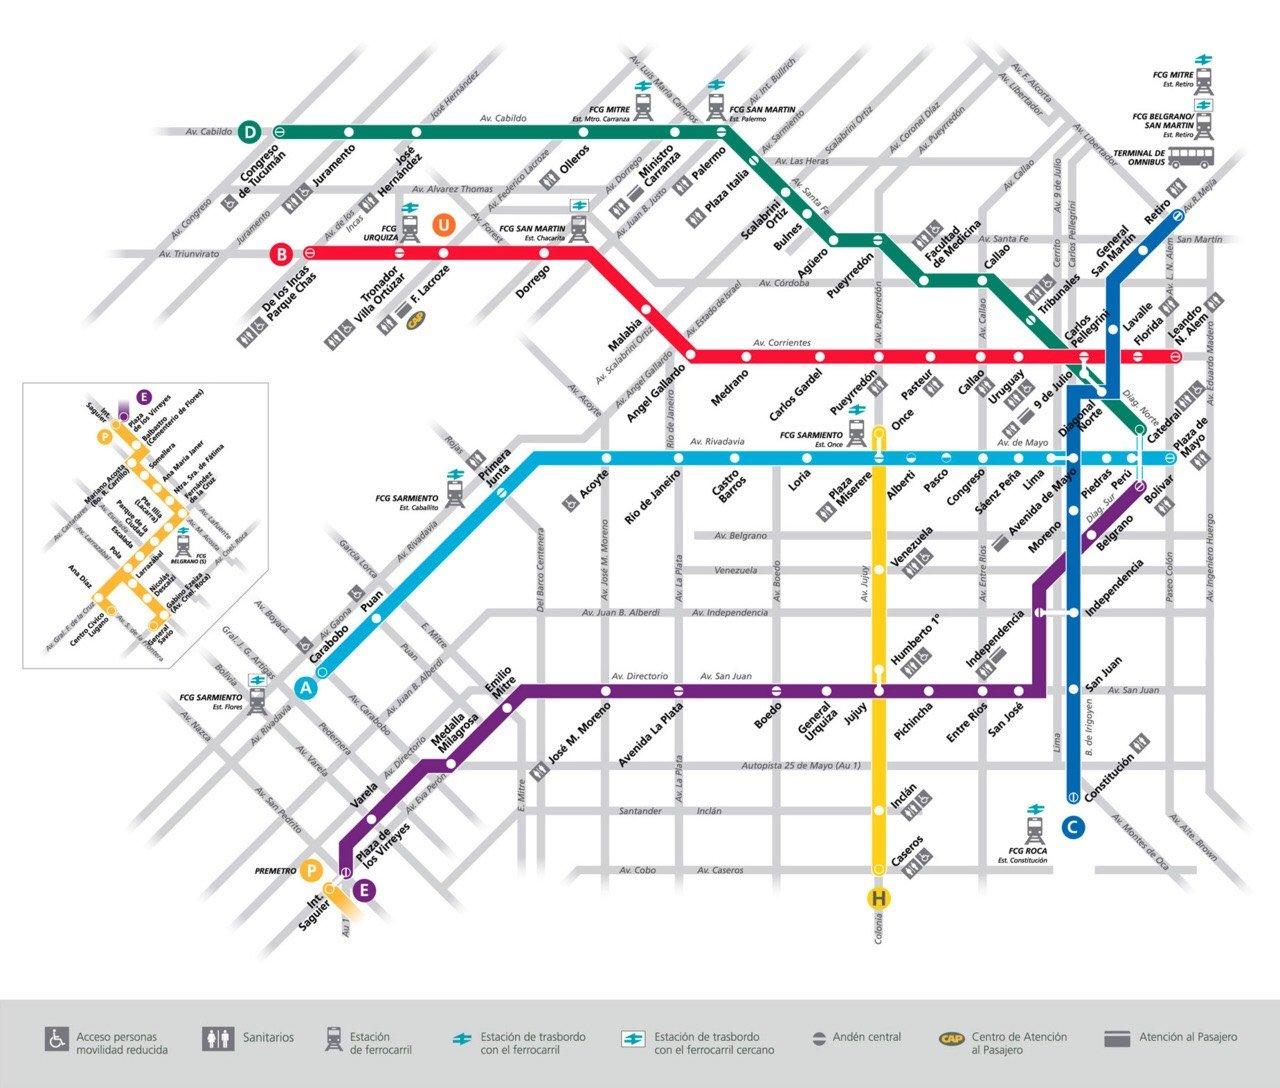 CAPAStudyAbroad_Buenos Aires_Summer 2018_From Nora Callahan - Subway (Subte) Map of Buenos Aires